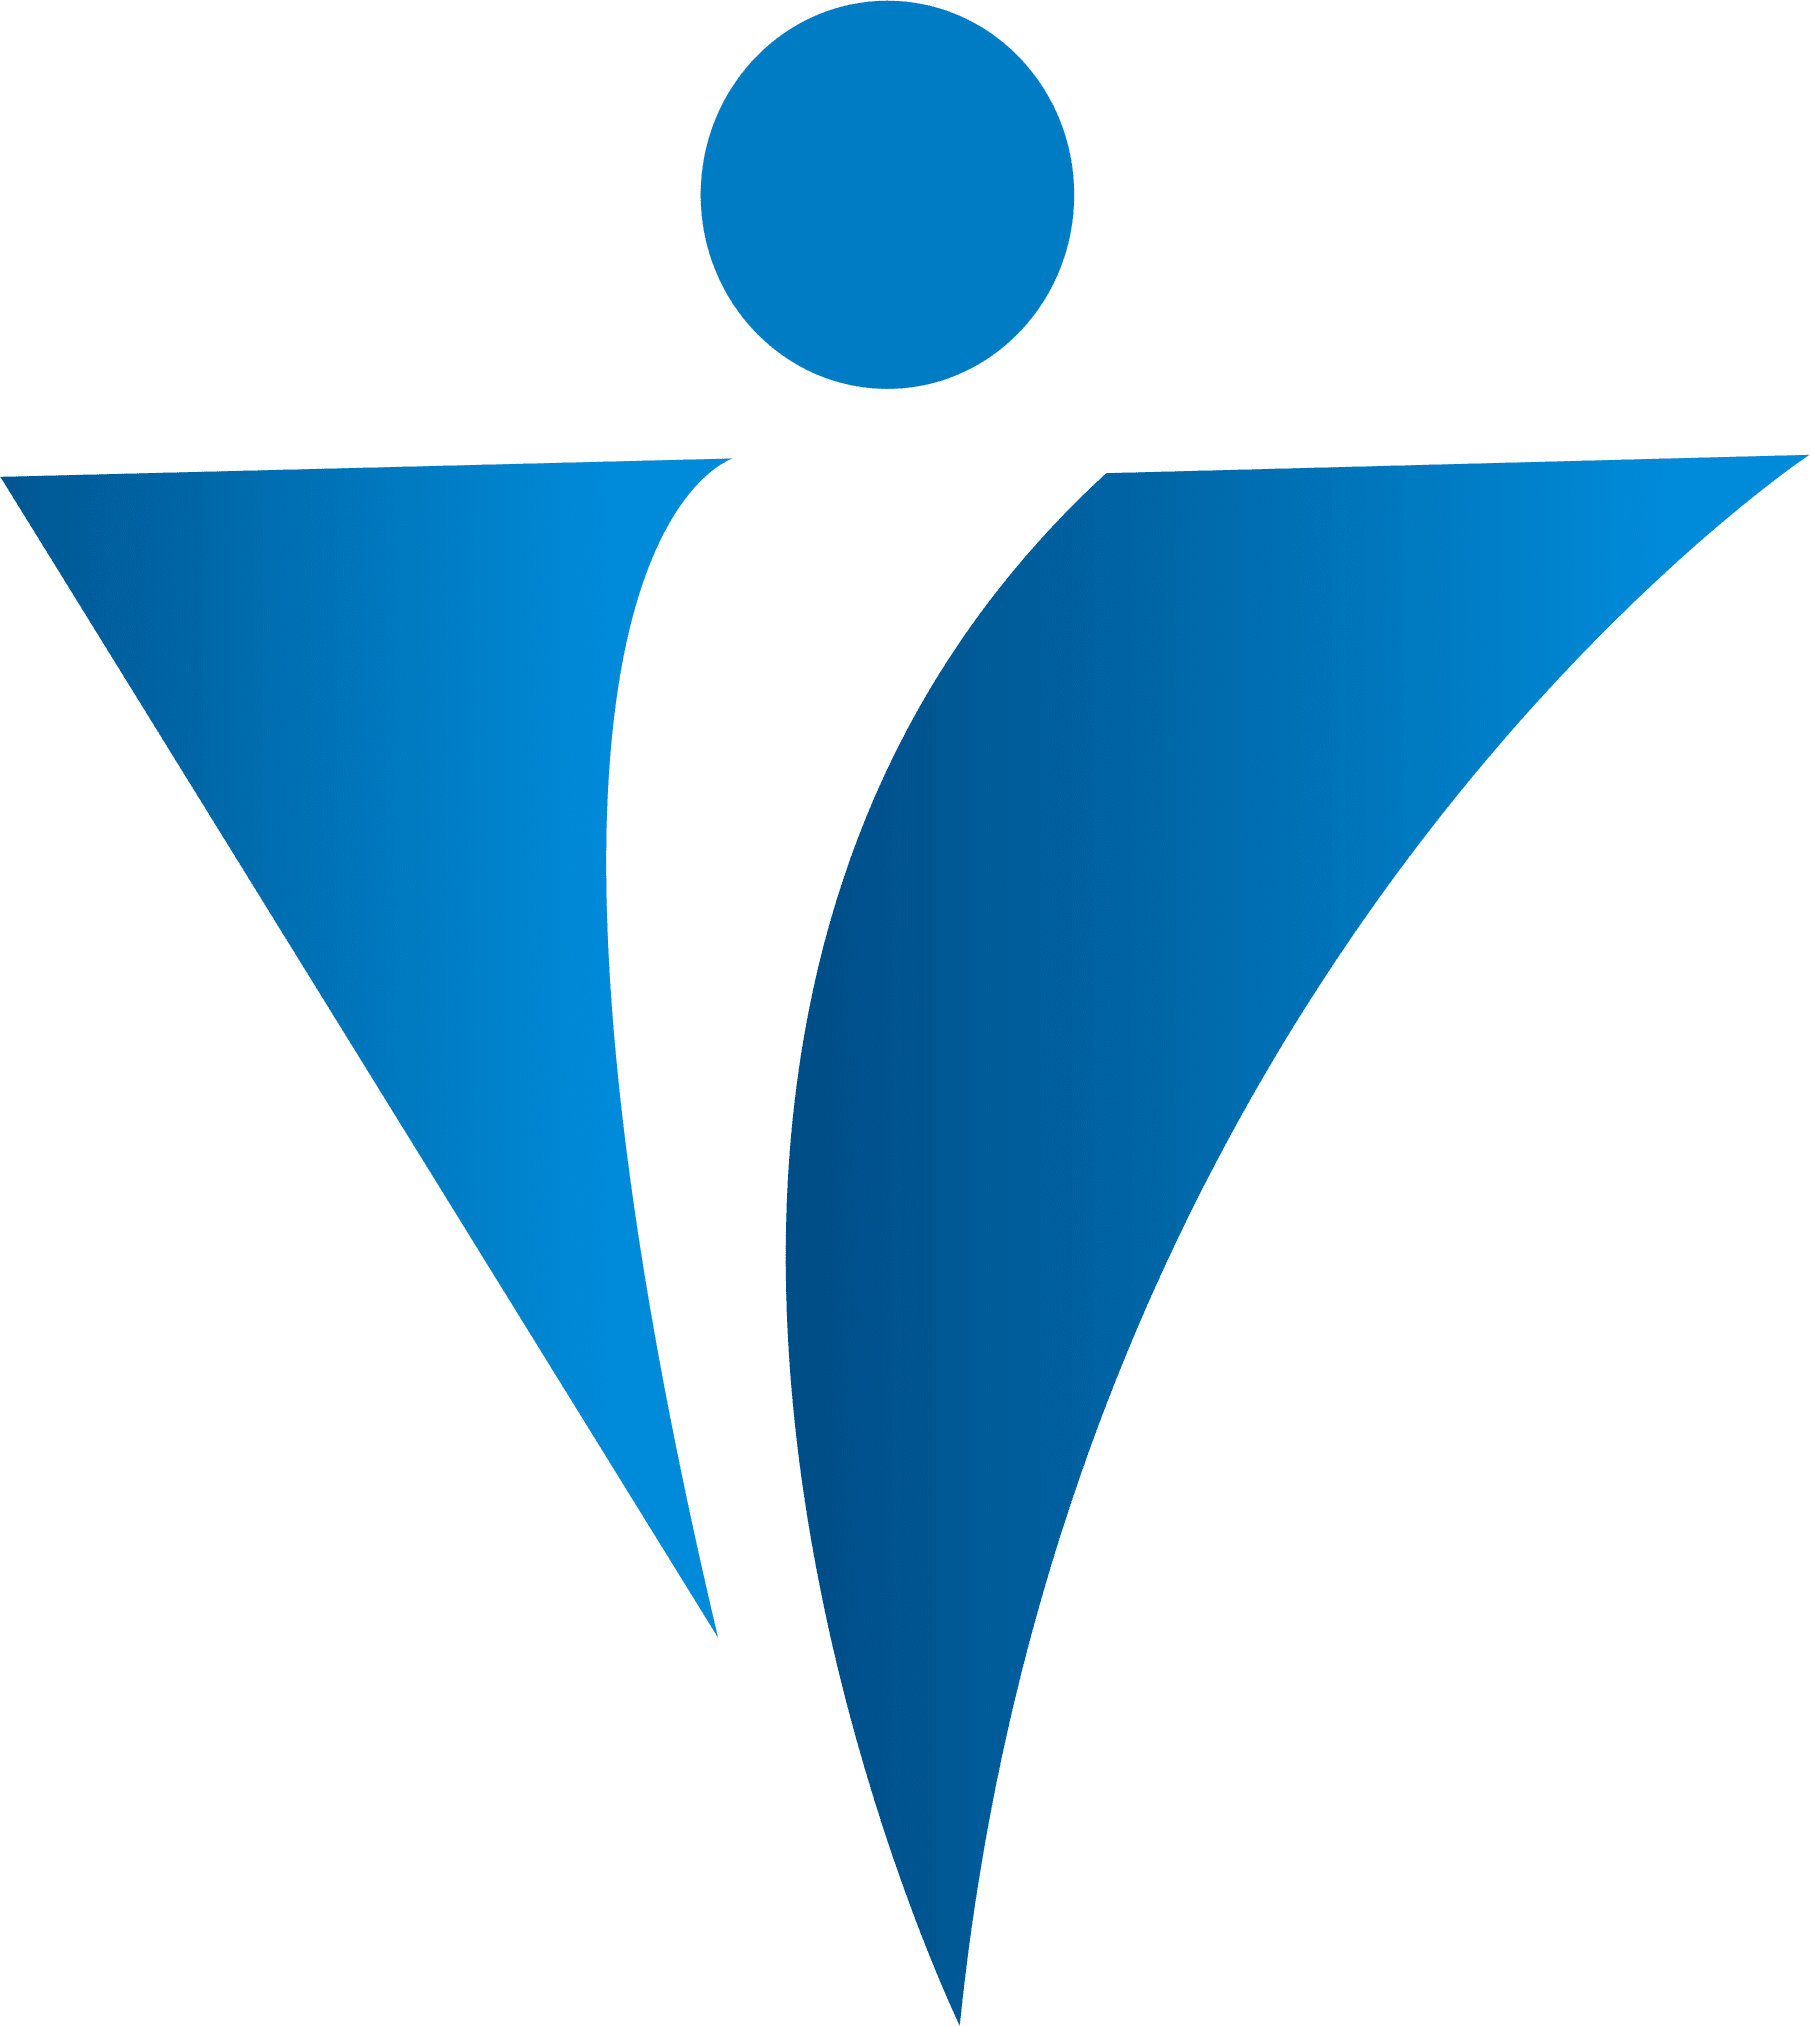 A7 Innovations PVT LTD